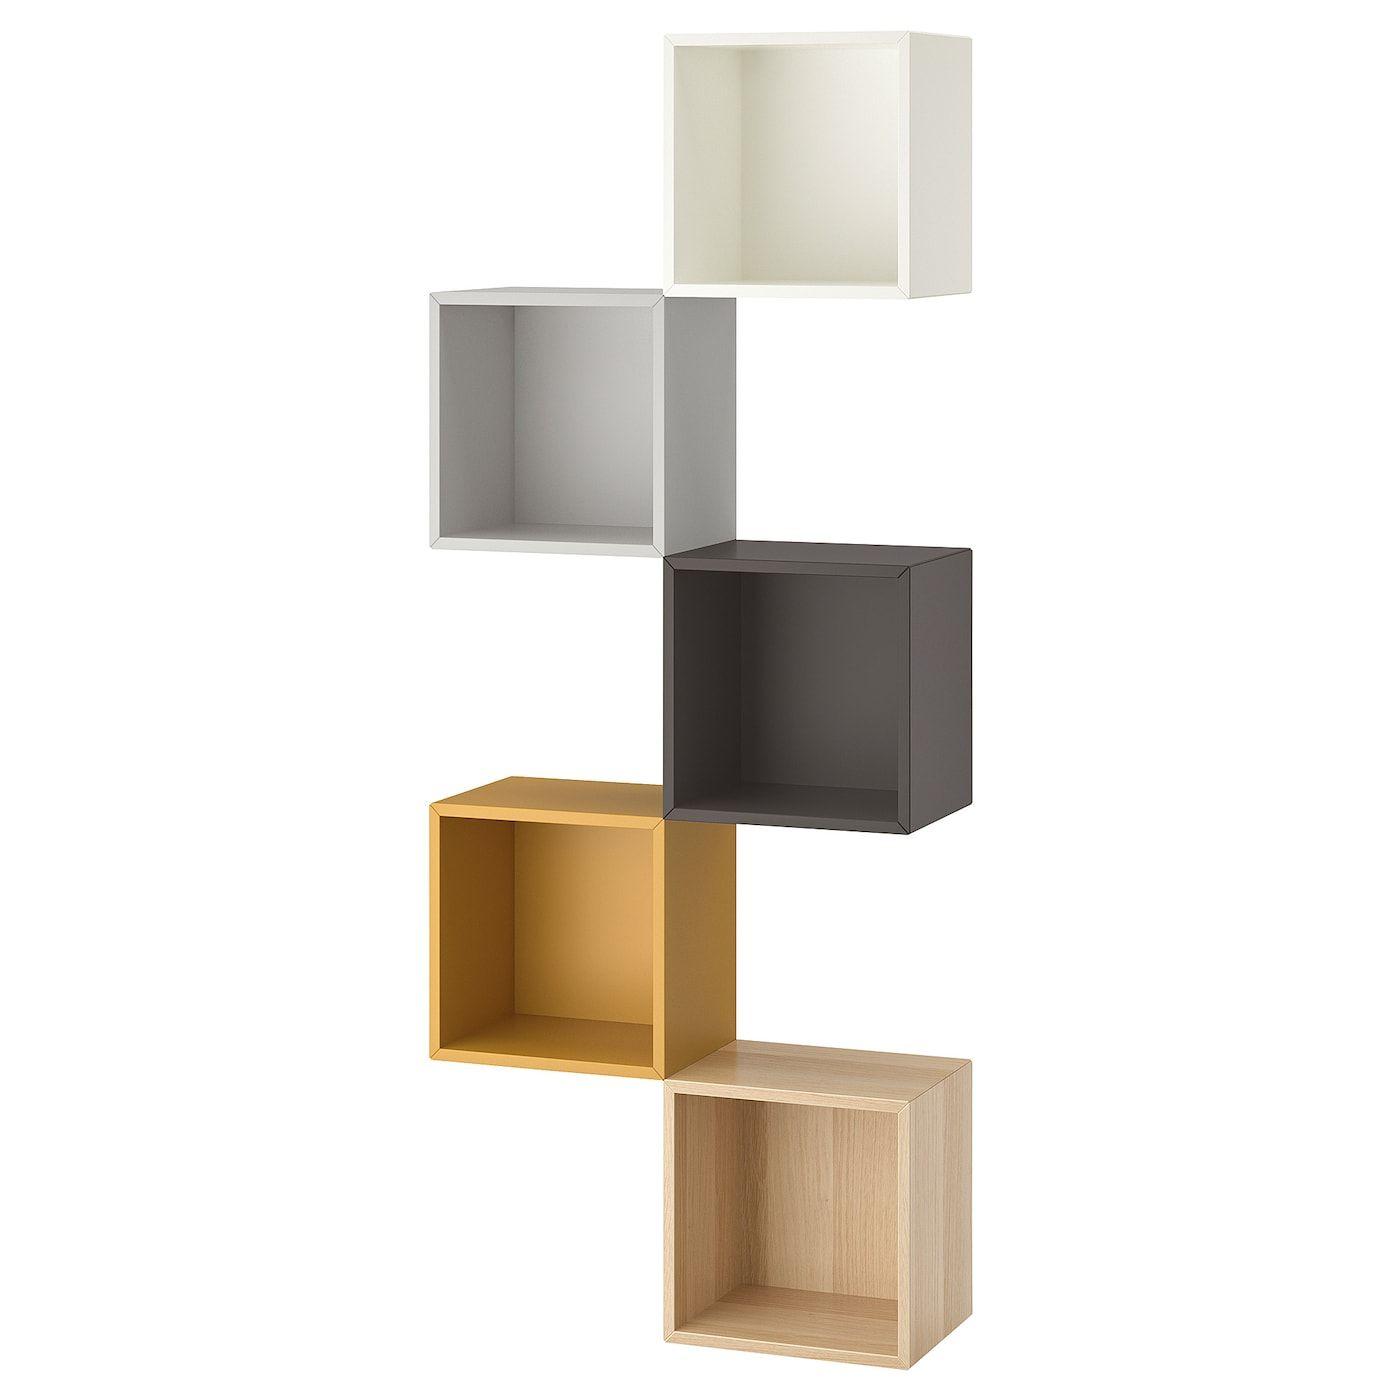 Ikea Eket Multicolor 1 Wall Mounted Storage Combination Wall